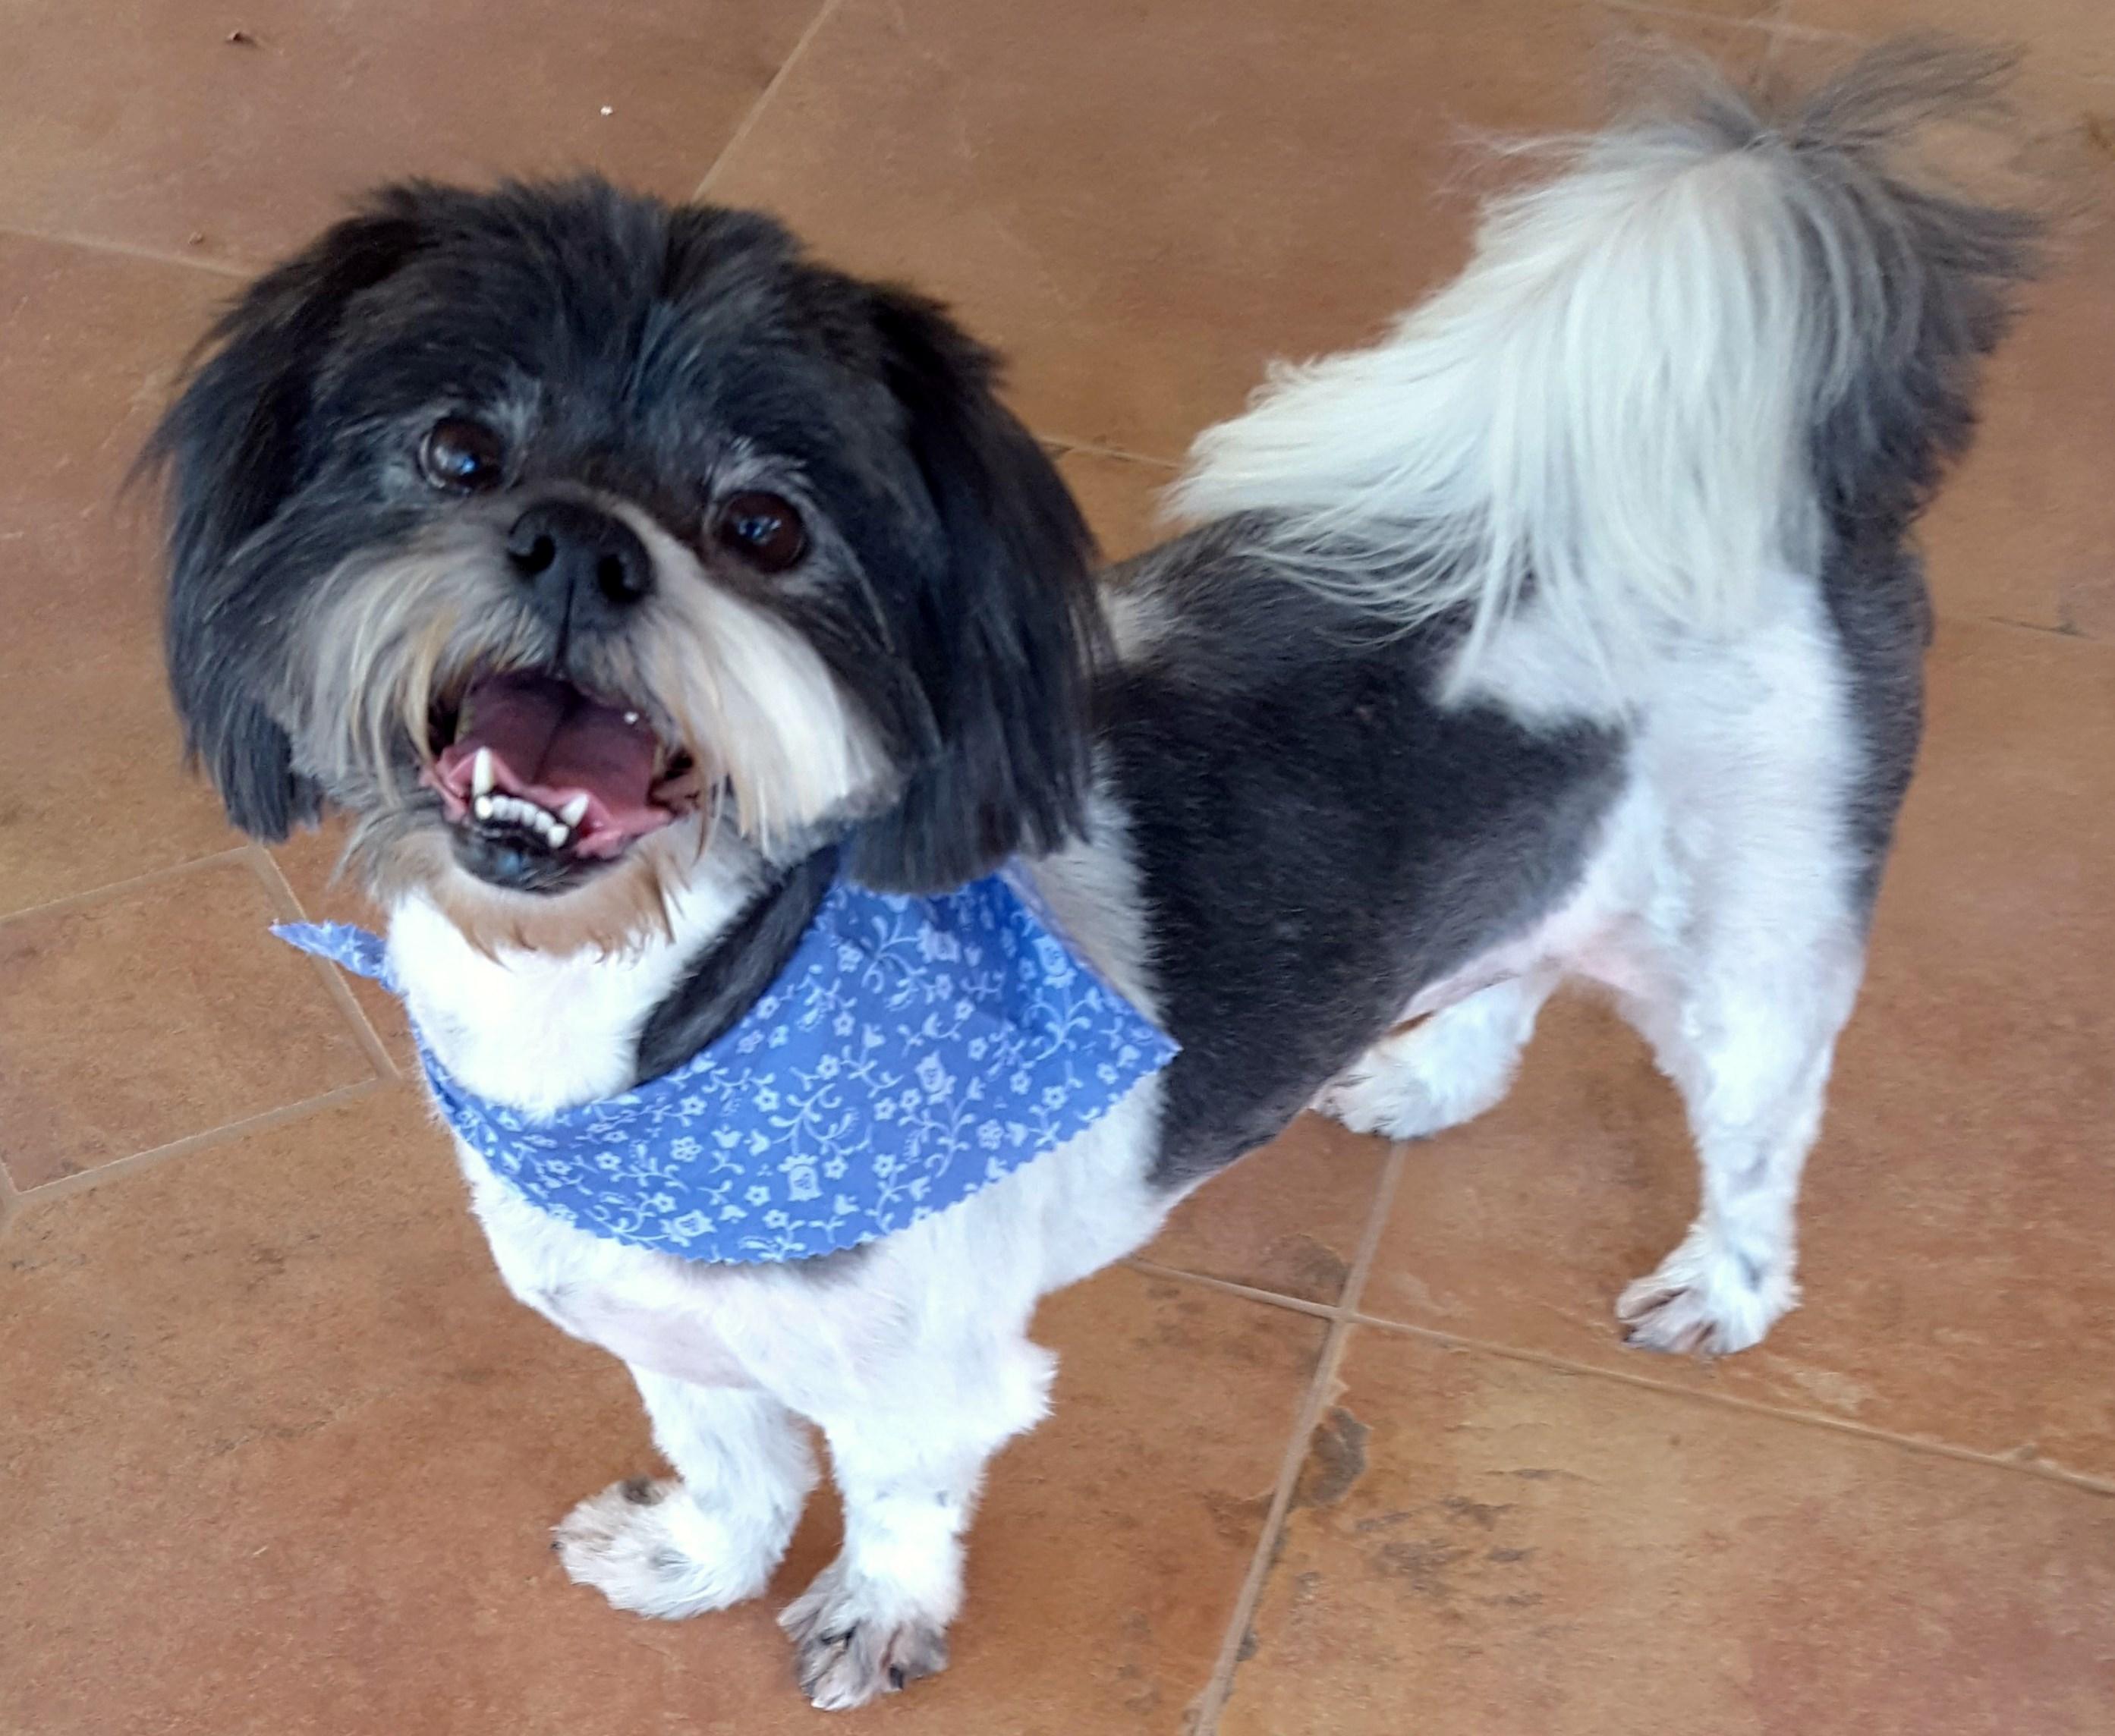 WCFA Pets Needing People